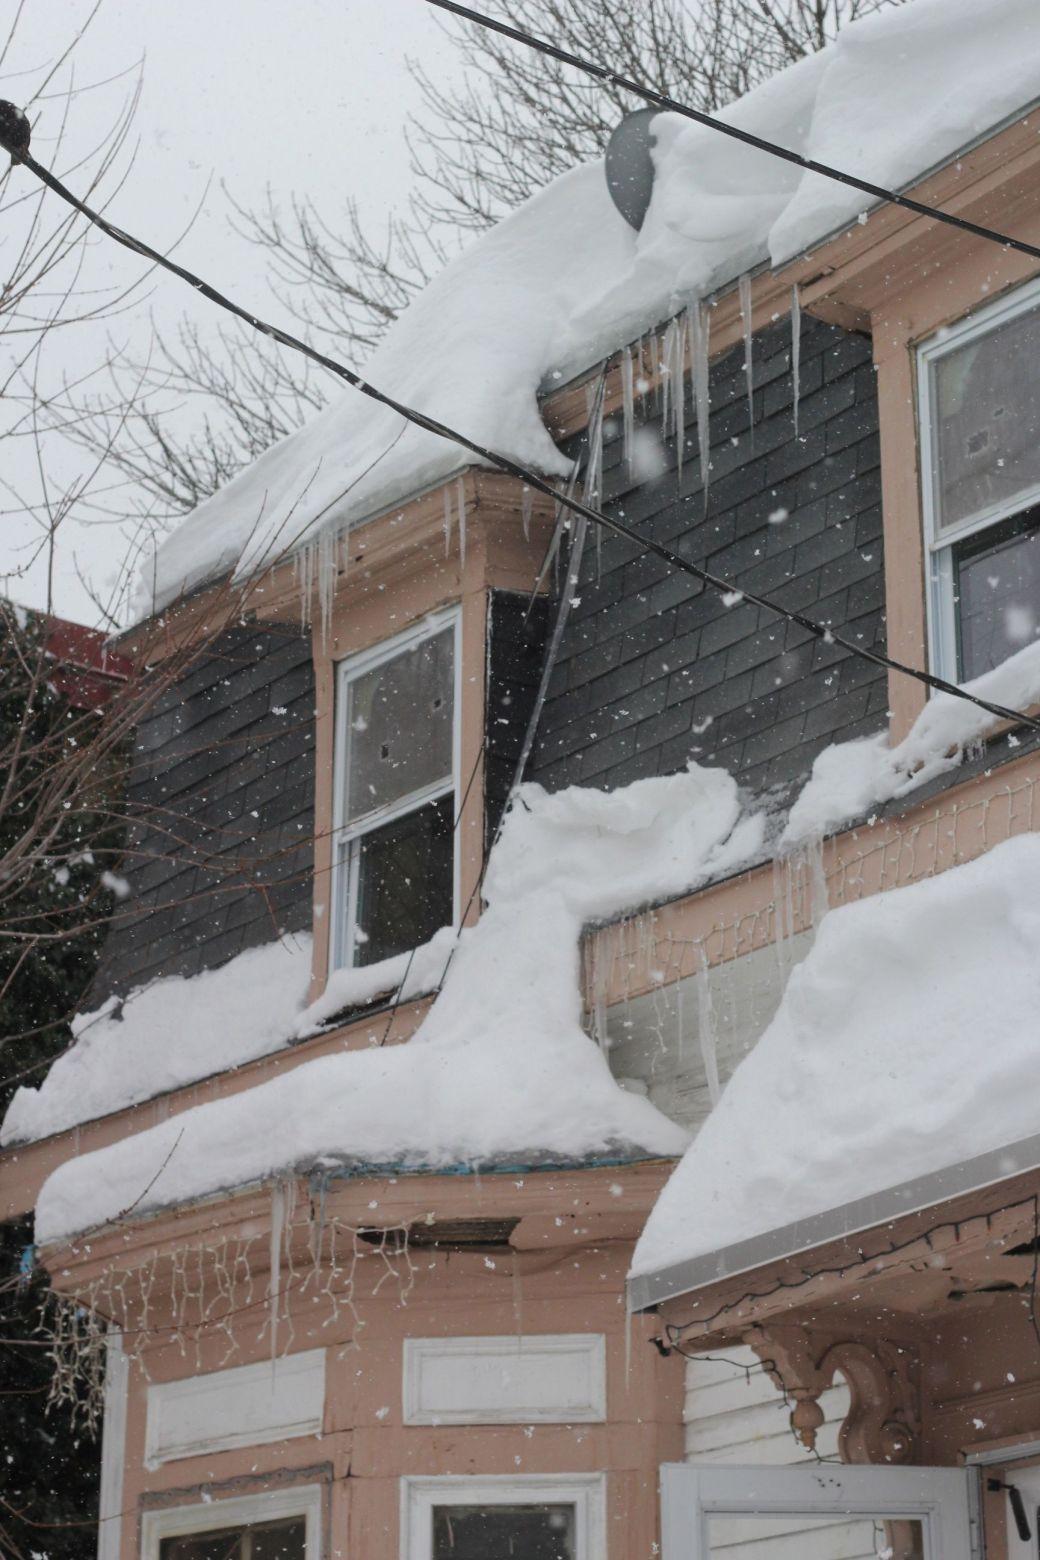 boston jamaica plain winter february 17 2015 house icicles